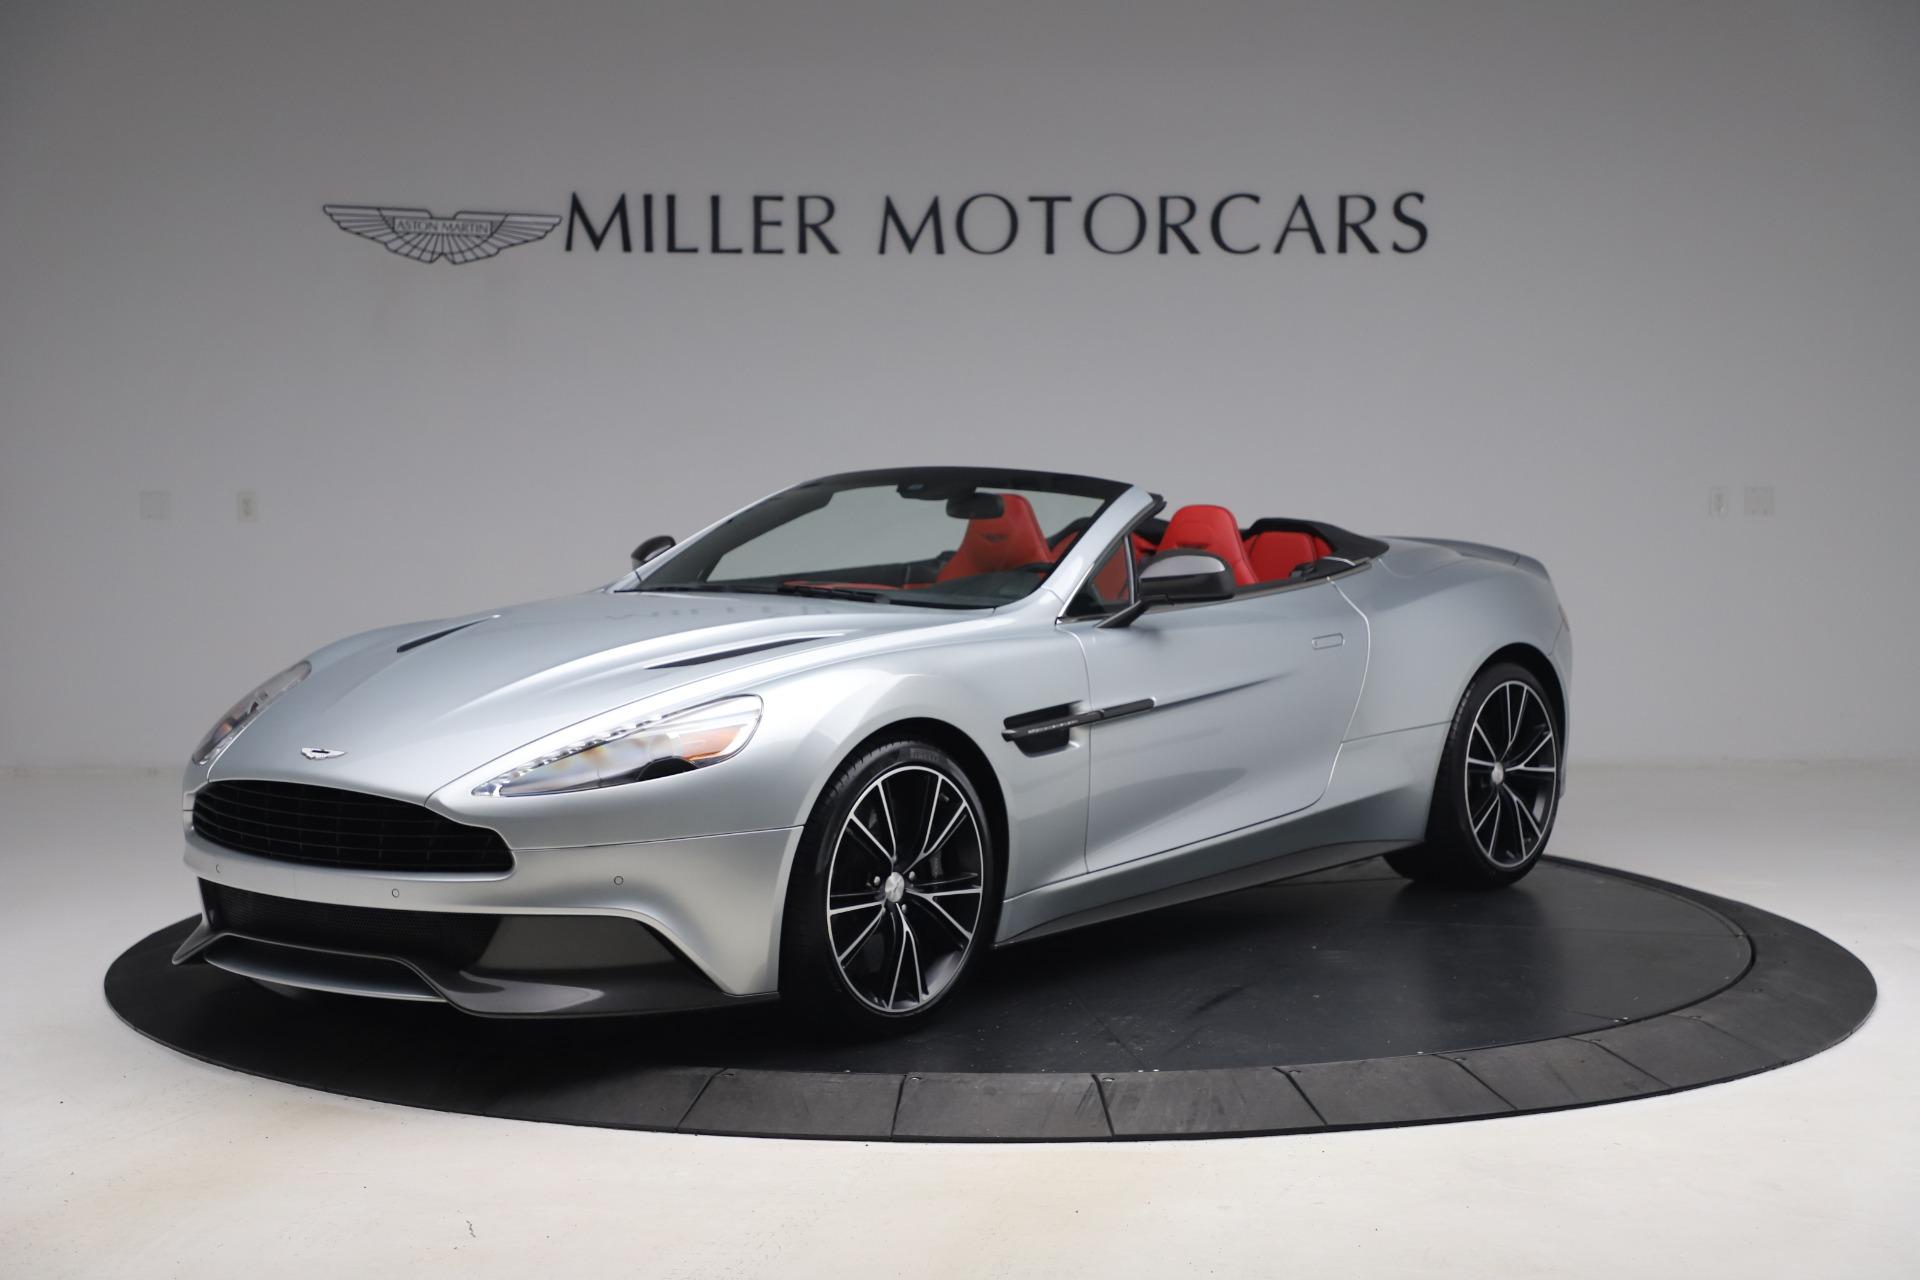 Used 2014 Aston Martin Vanquish Volante for sale $129,900 at McLaren Greenwich in Greenwich CT 06830 1